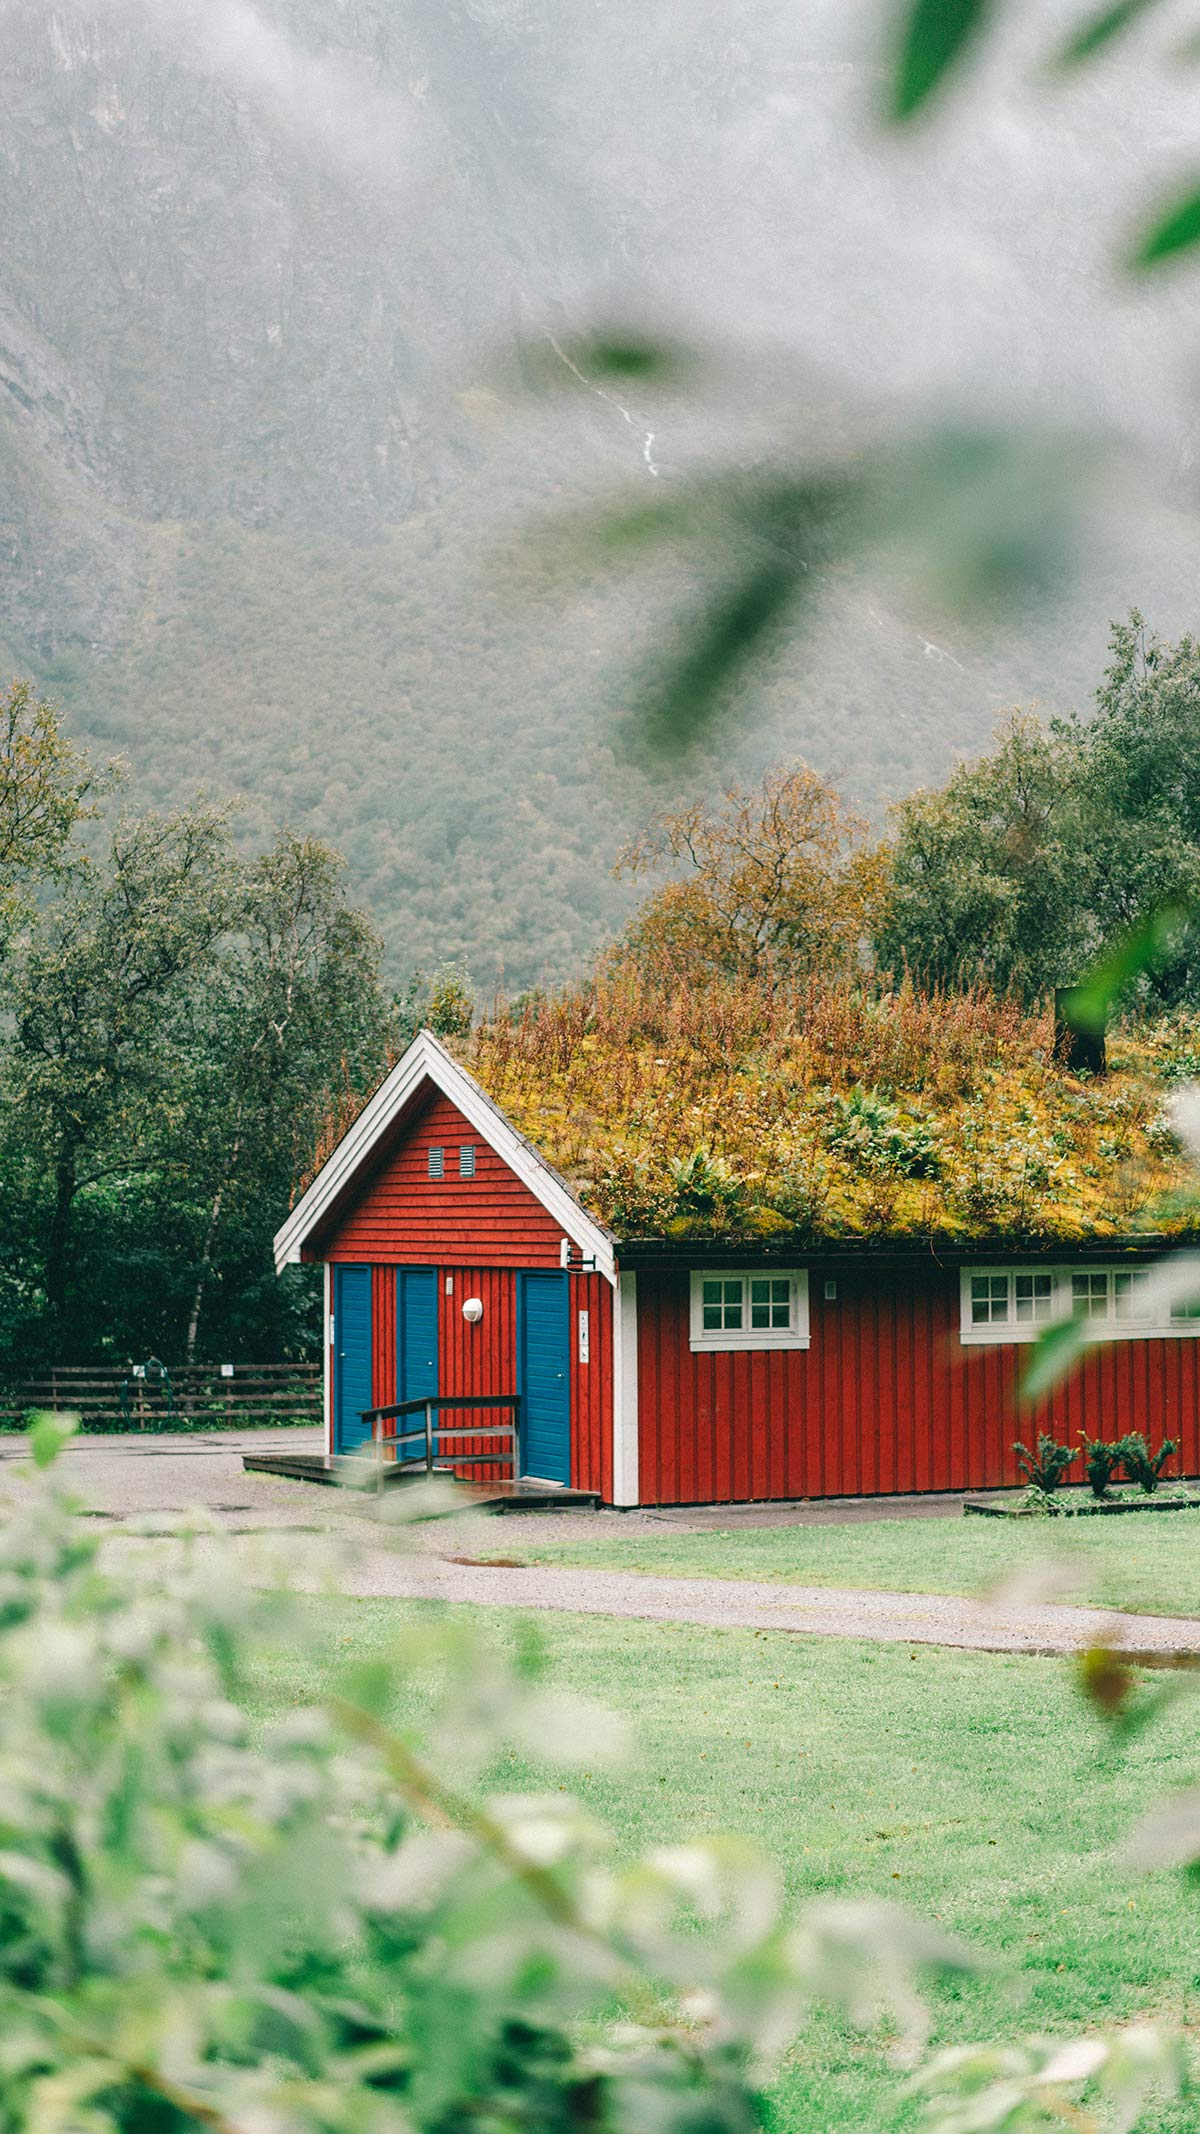 Trollveggen Campingplatz Toilettenhaus